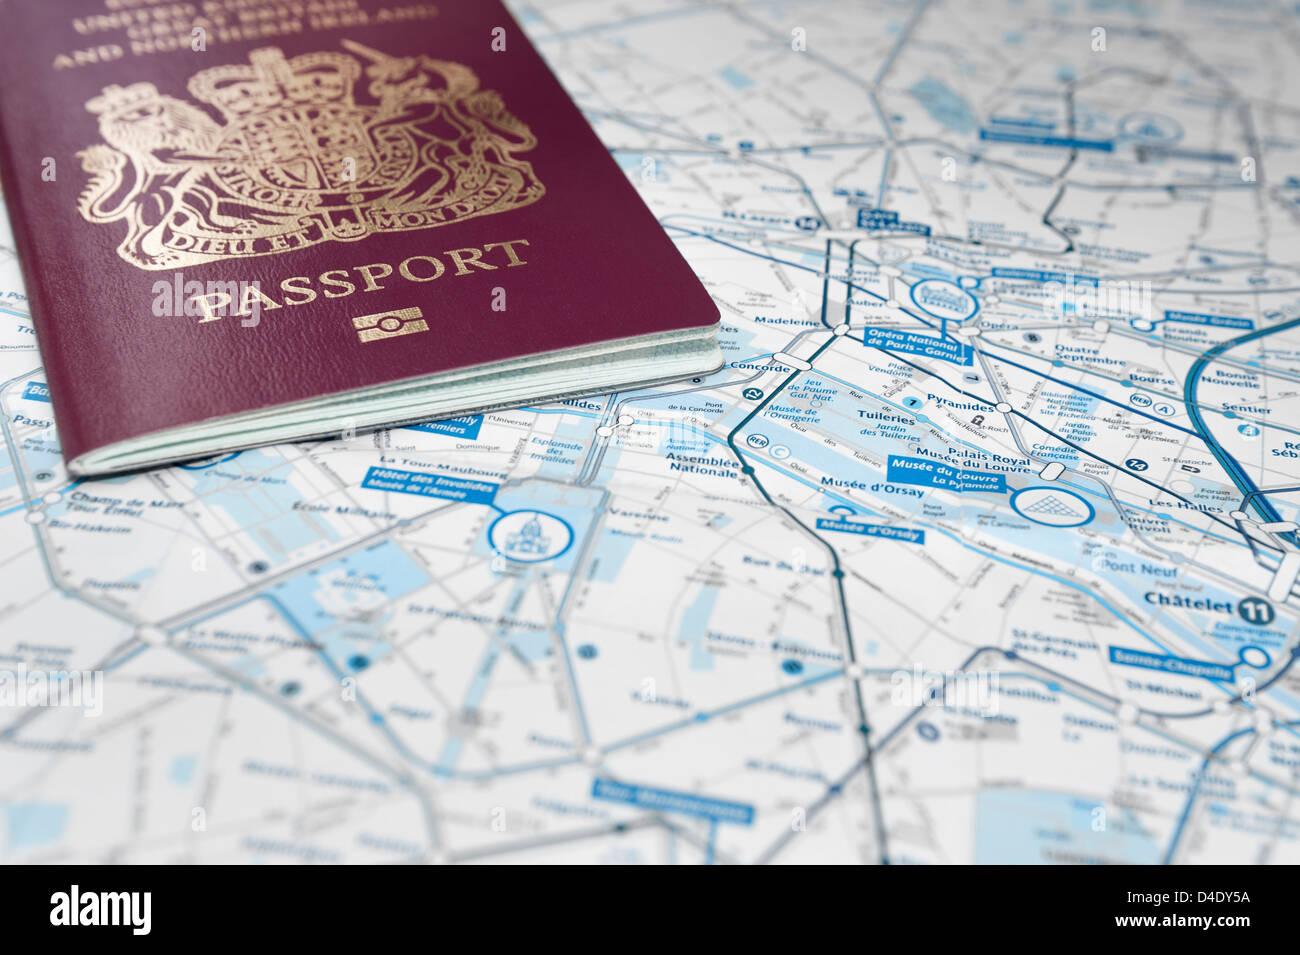 British passport on a city map of Paris, Europe - Stock Image